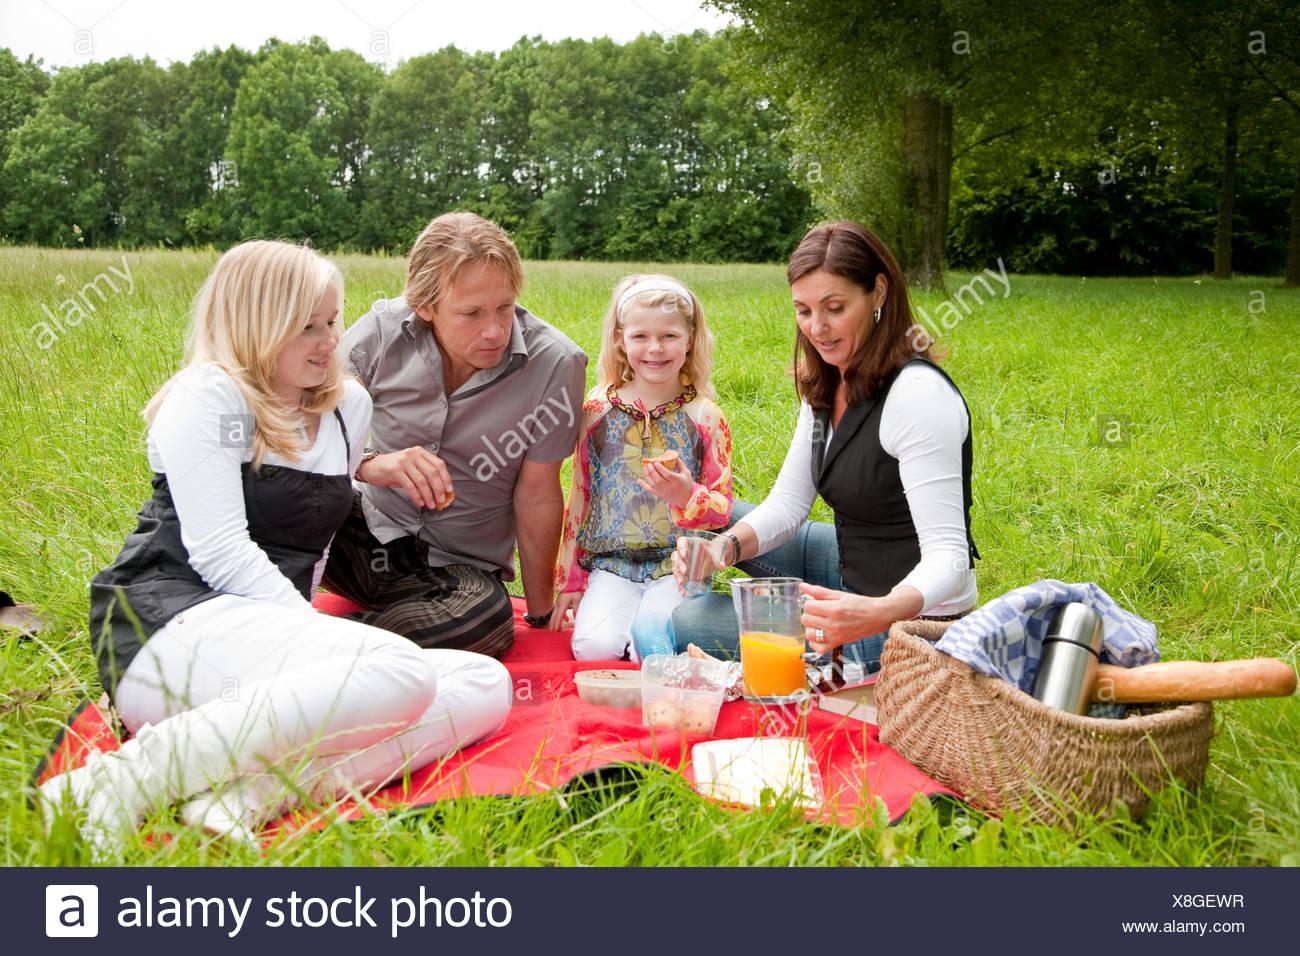 Family picnic - Stock Image